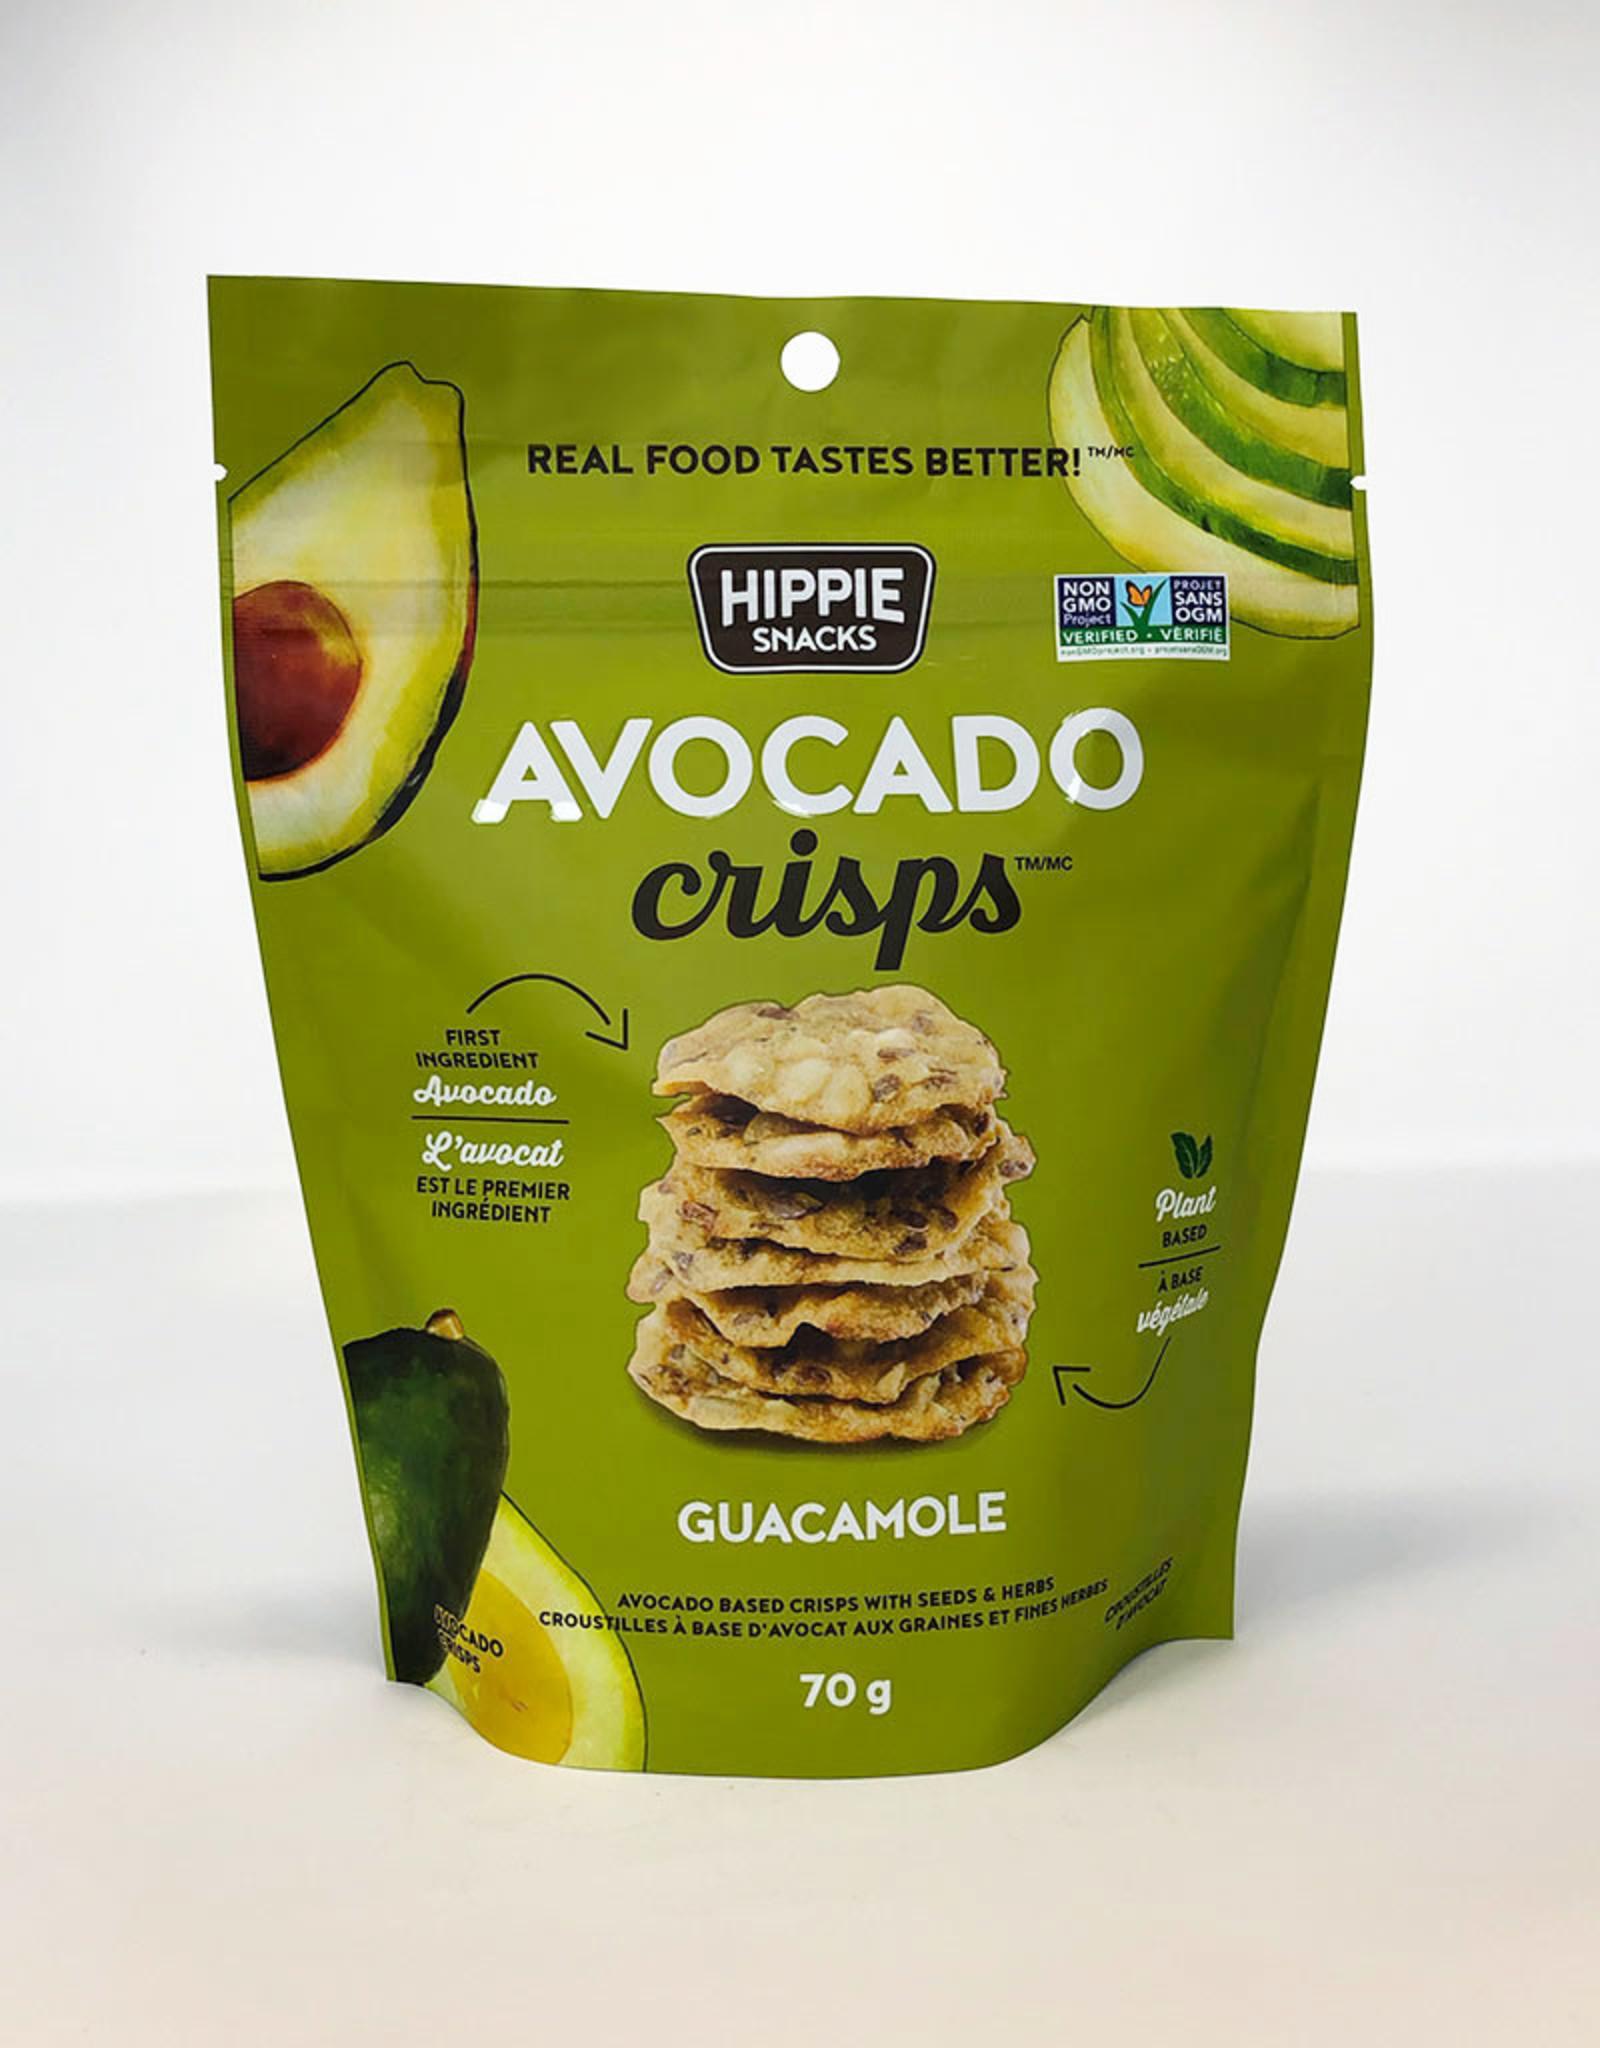 Hippie Snacks Hippie Snacks - Avocado Crisps, Guacamole